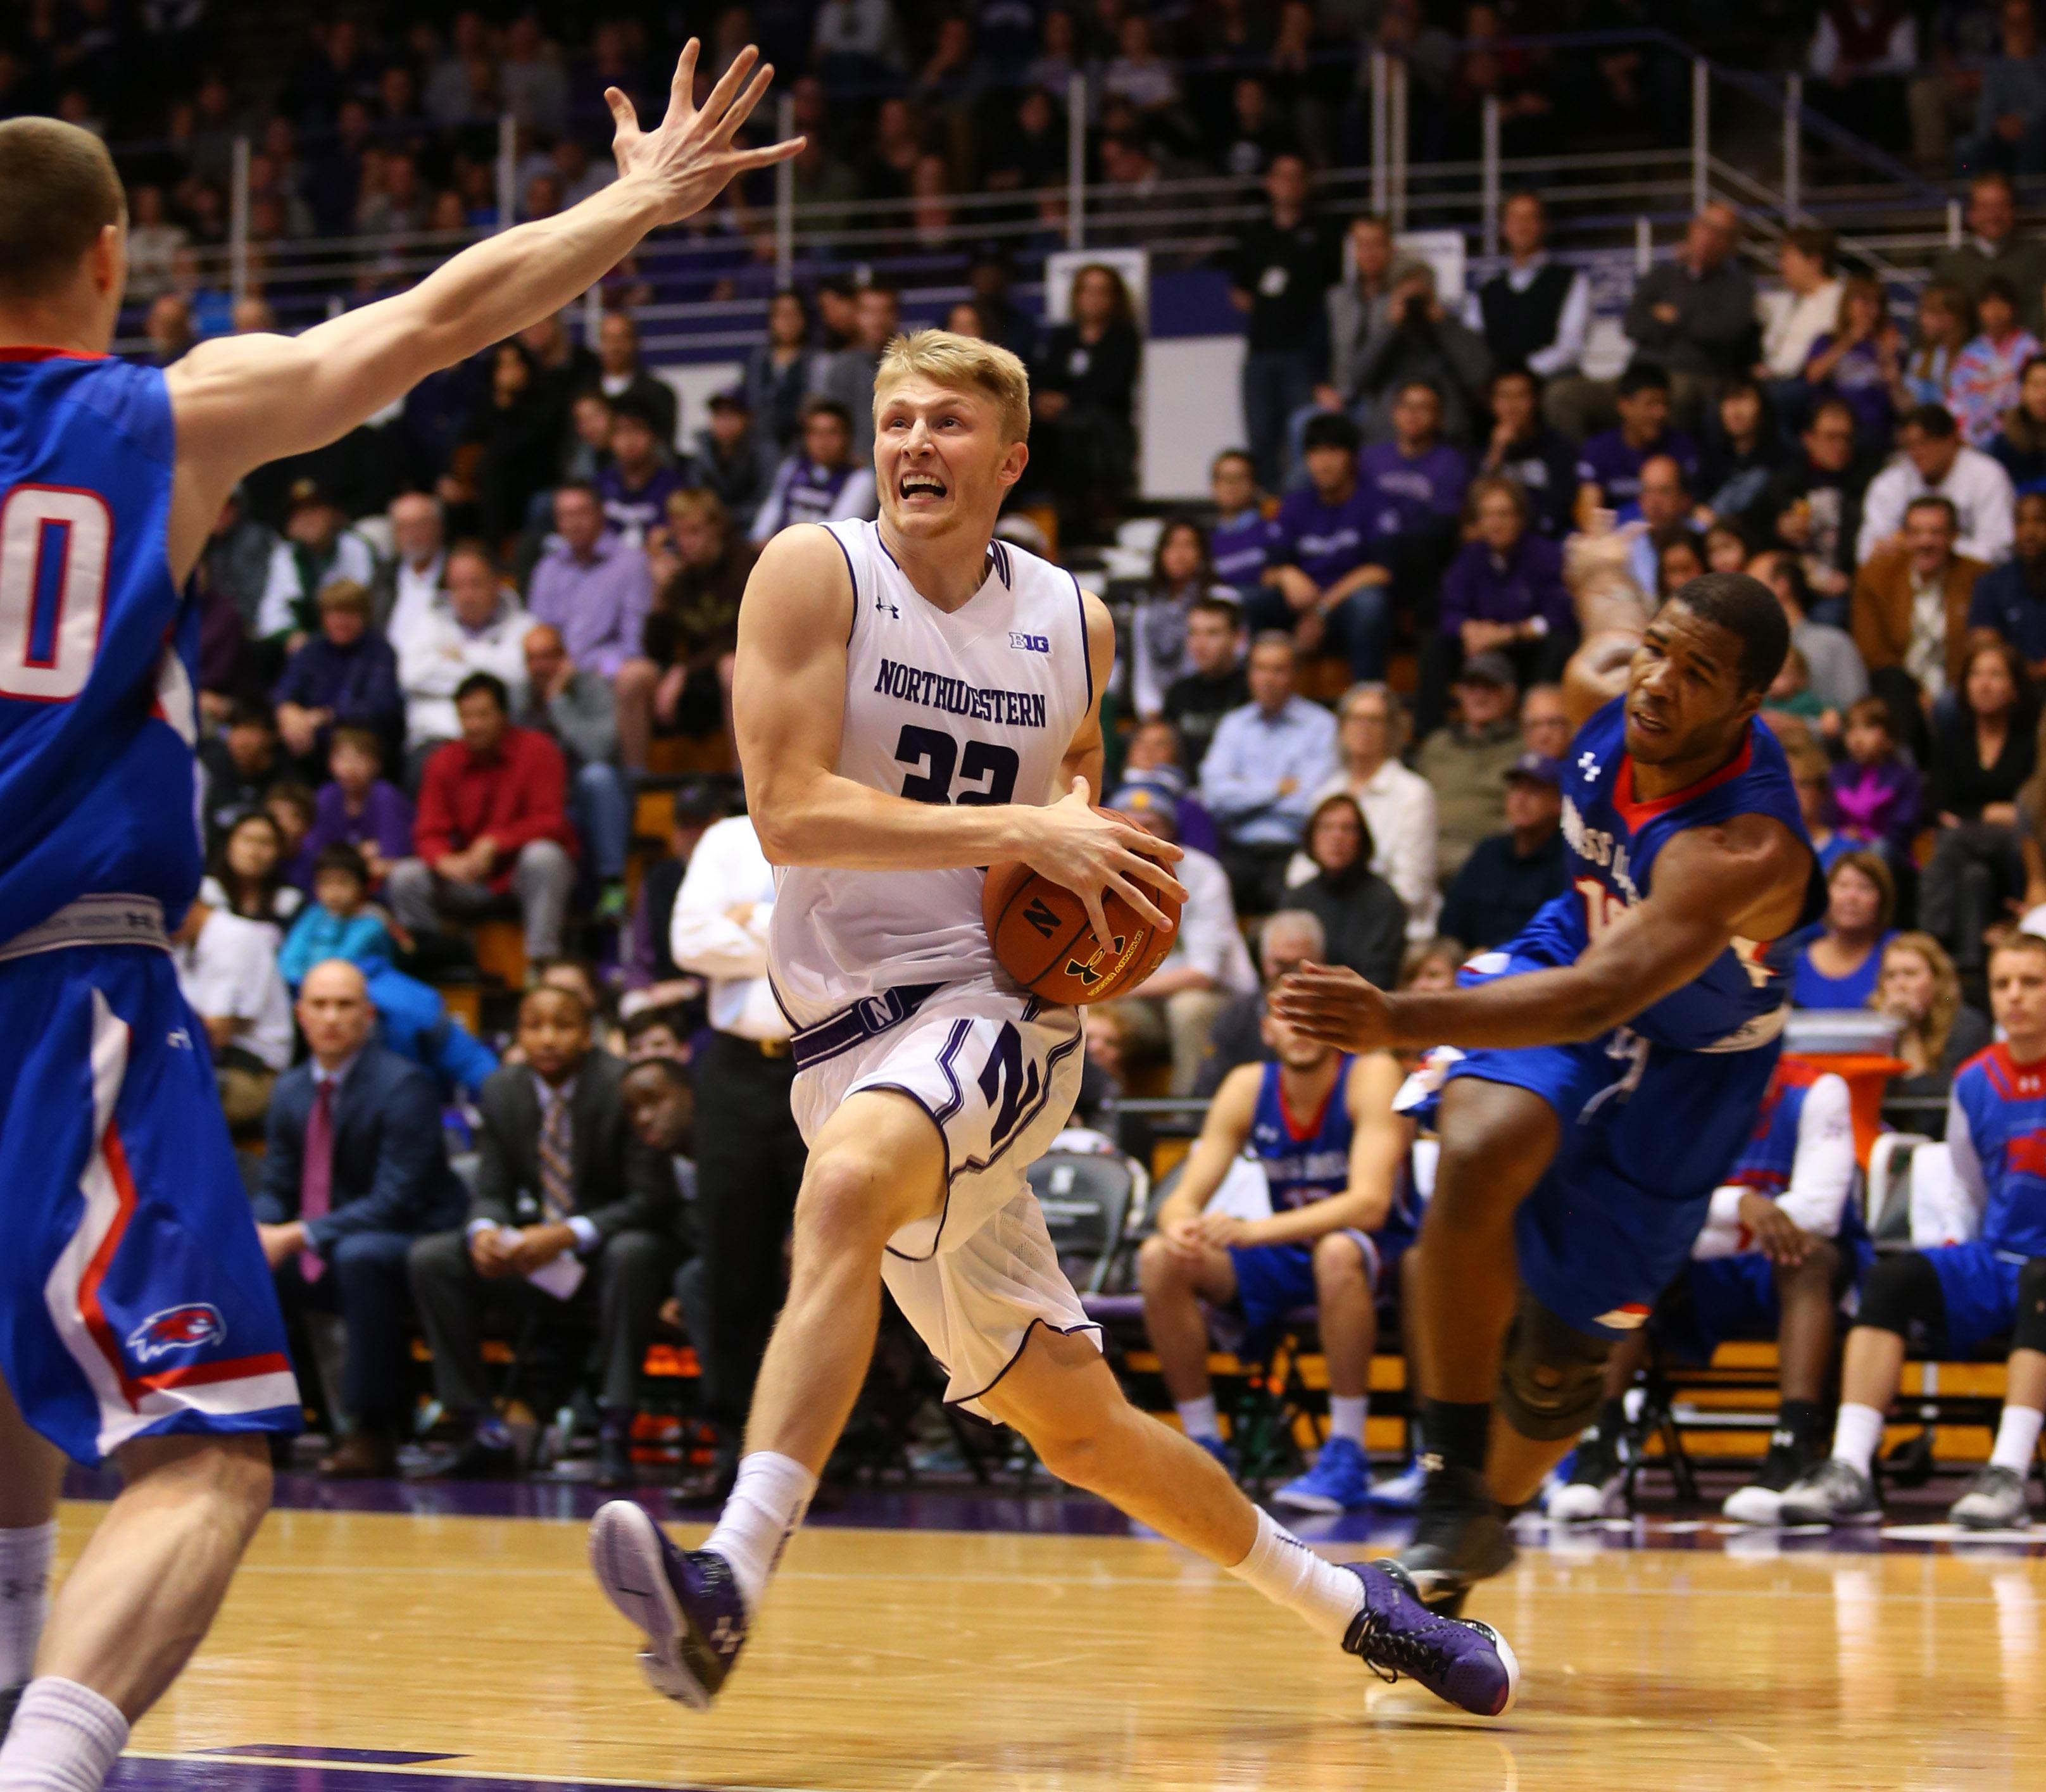 NCAA Basketball: Massachusetts Lowell at Northwestern